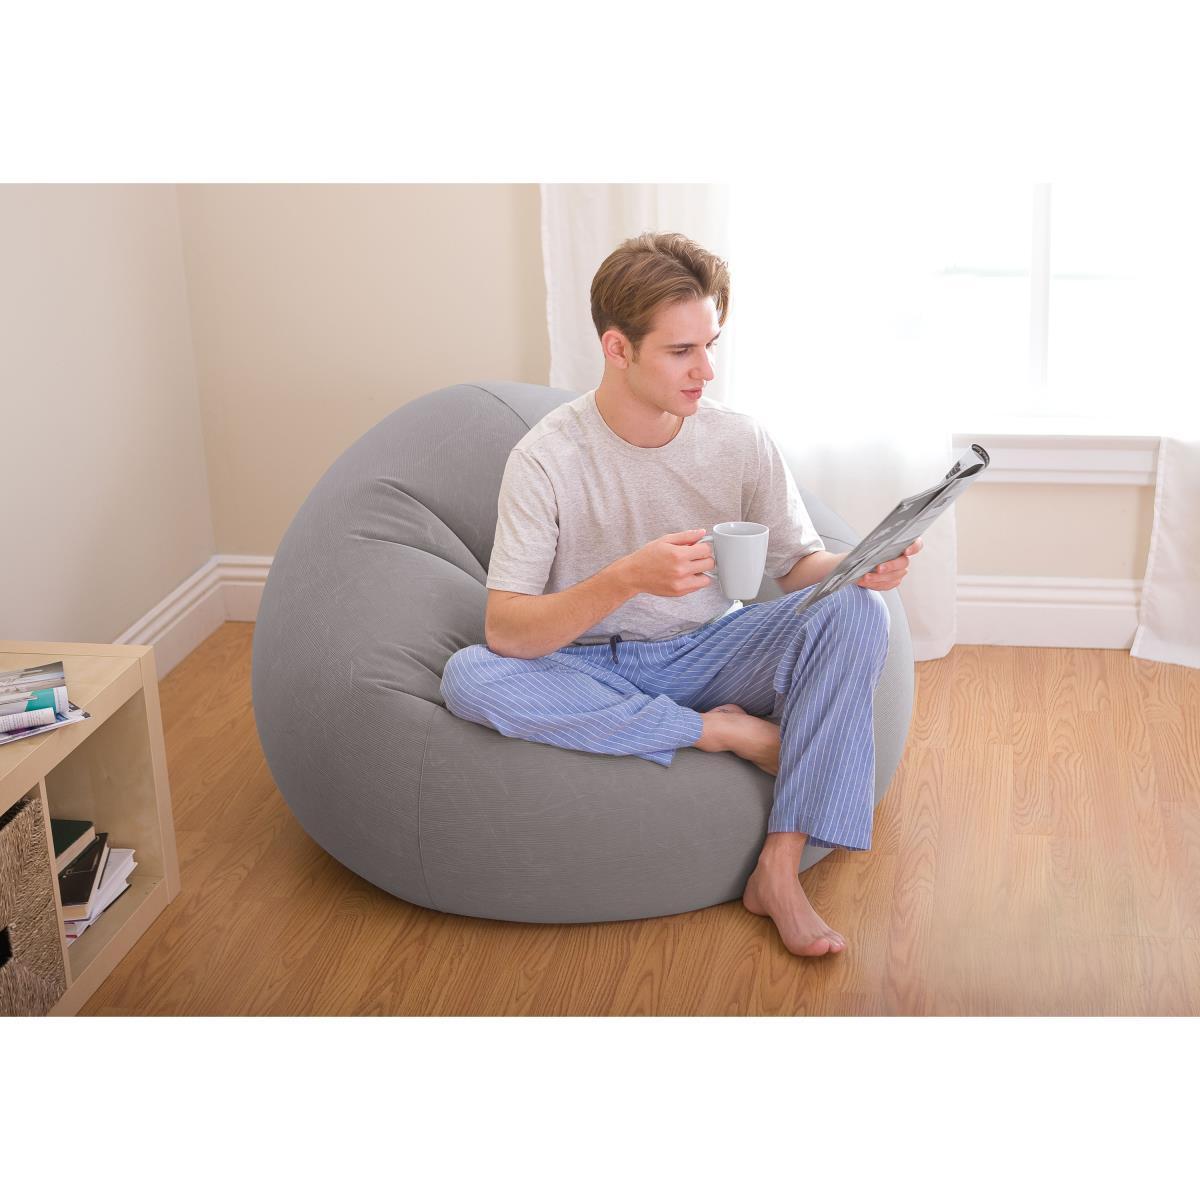 Intex Beanless Bag Chair Sitzsack aufblasbar 114x114x71 cm grau Aufblasmöbel,Intex ,68579NP, 6941057402758